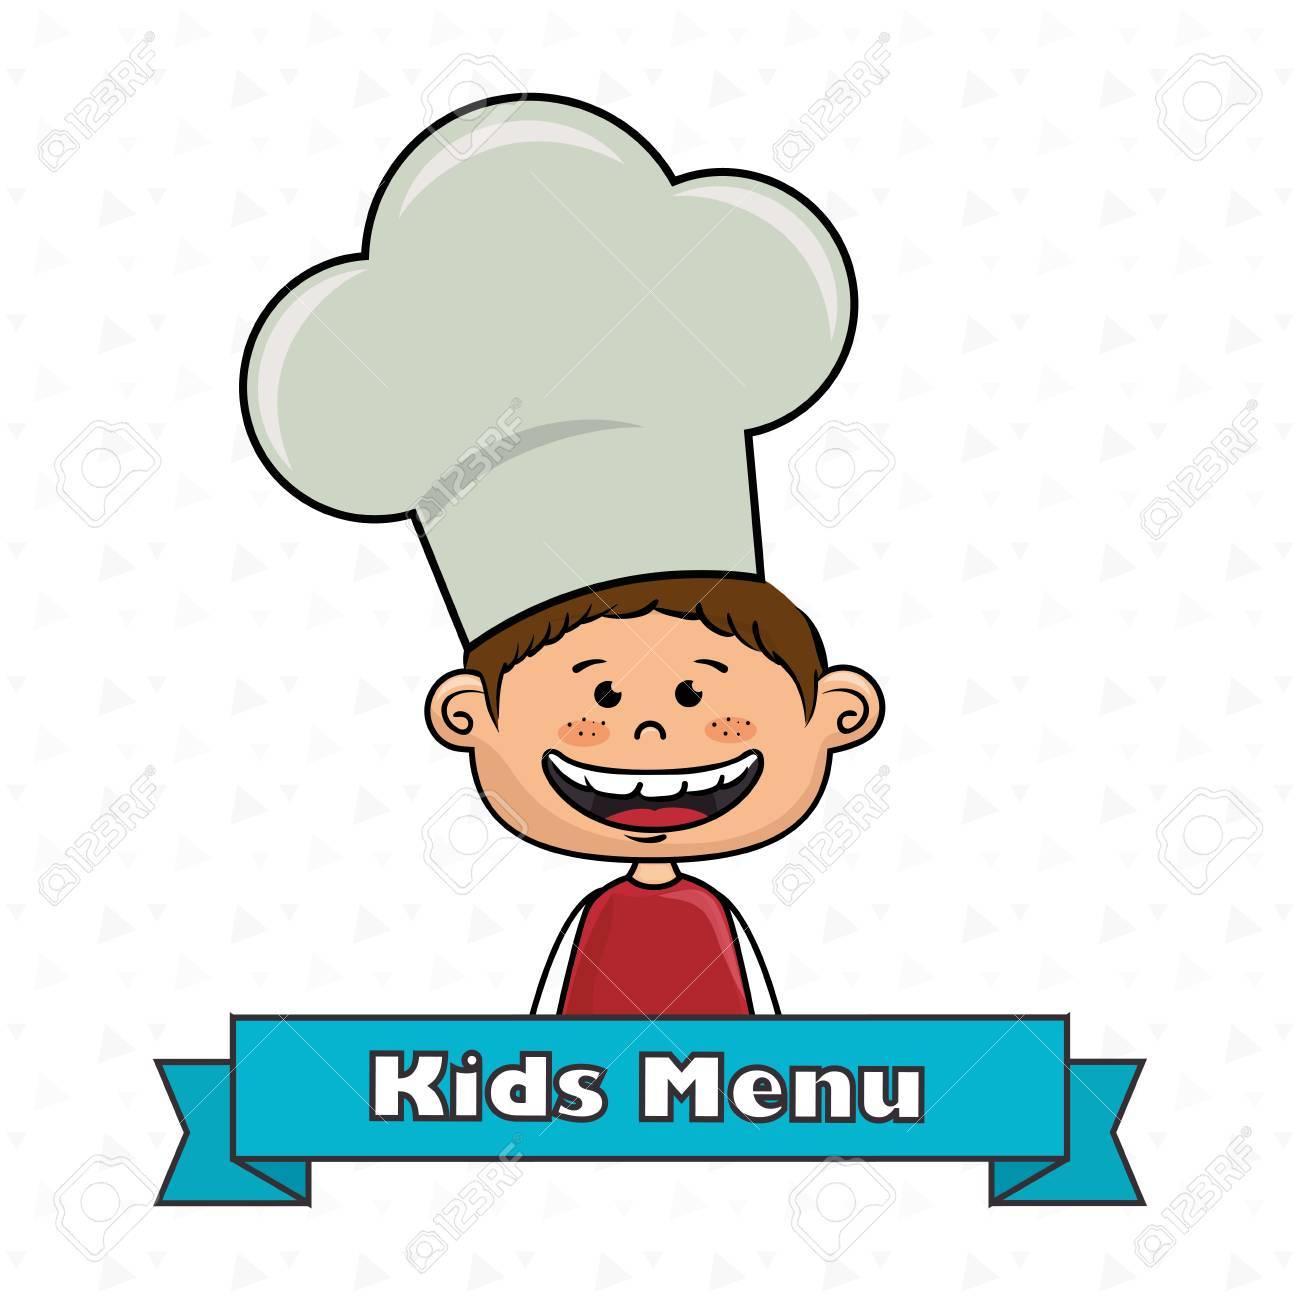 Kids menu clipart graphic free Boy kids menu food » Clipart Portal graphic free